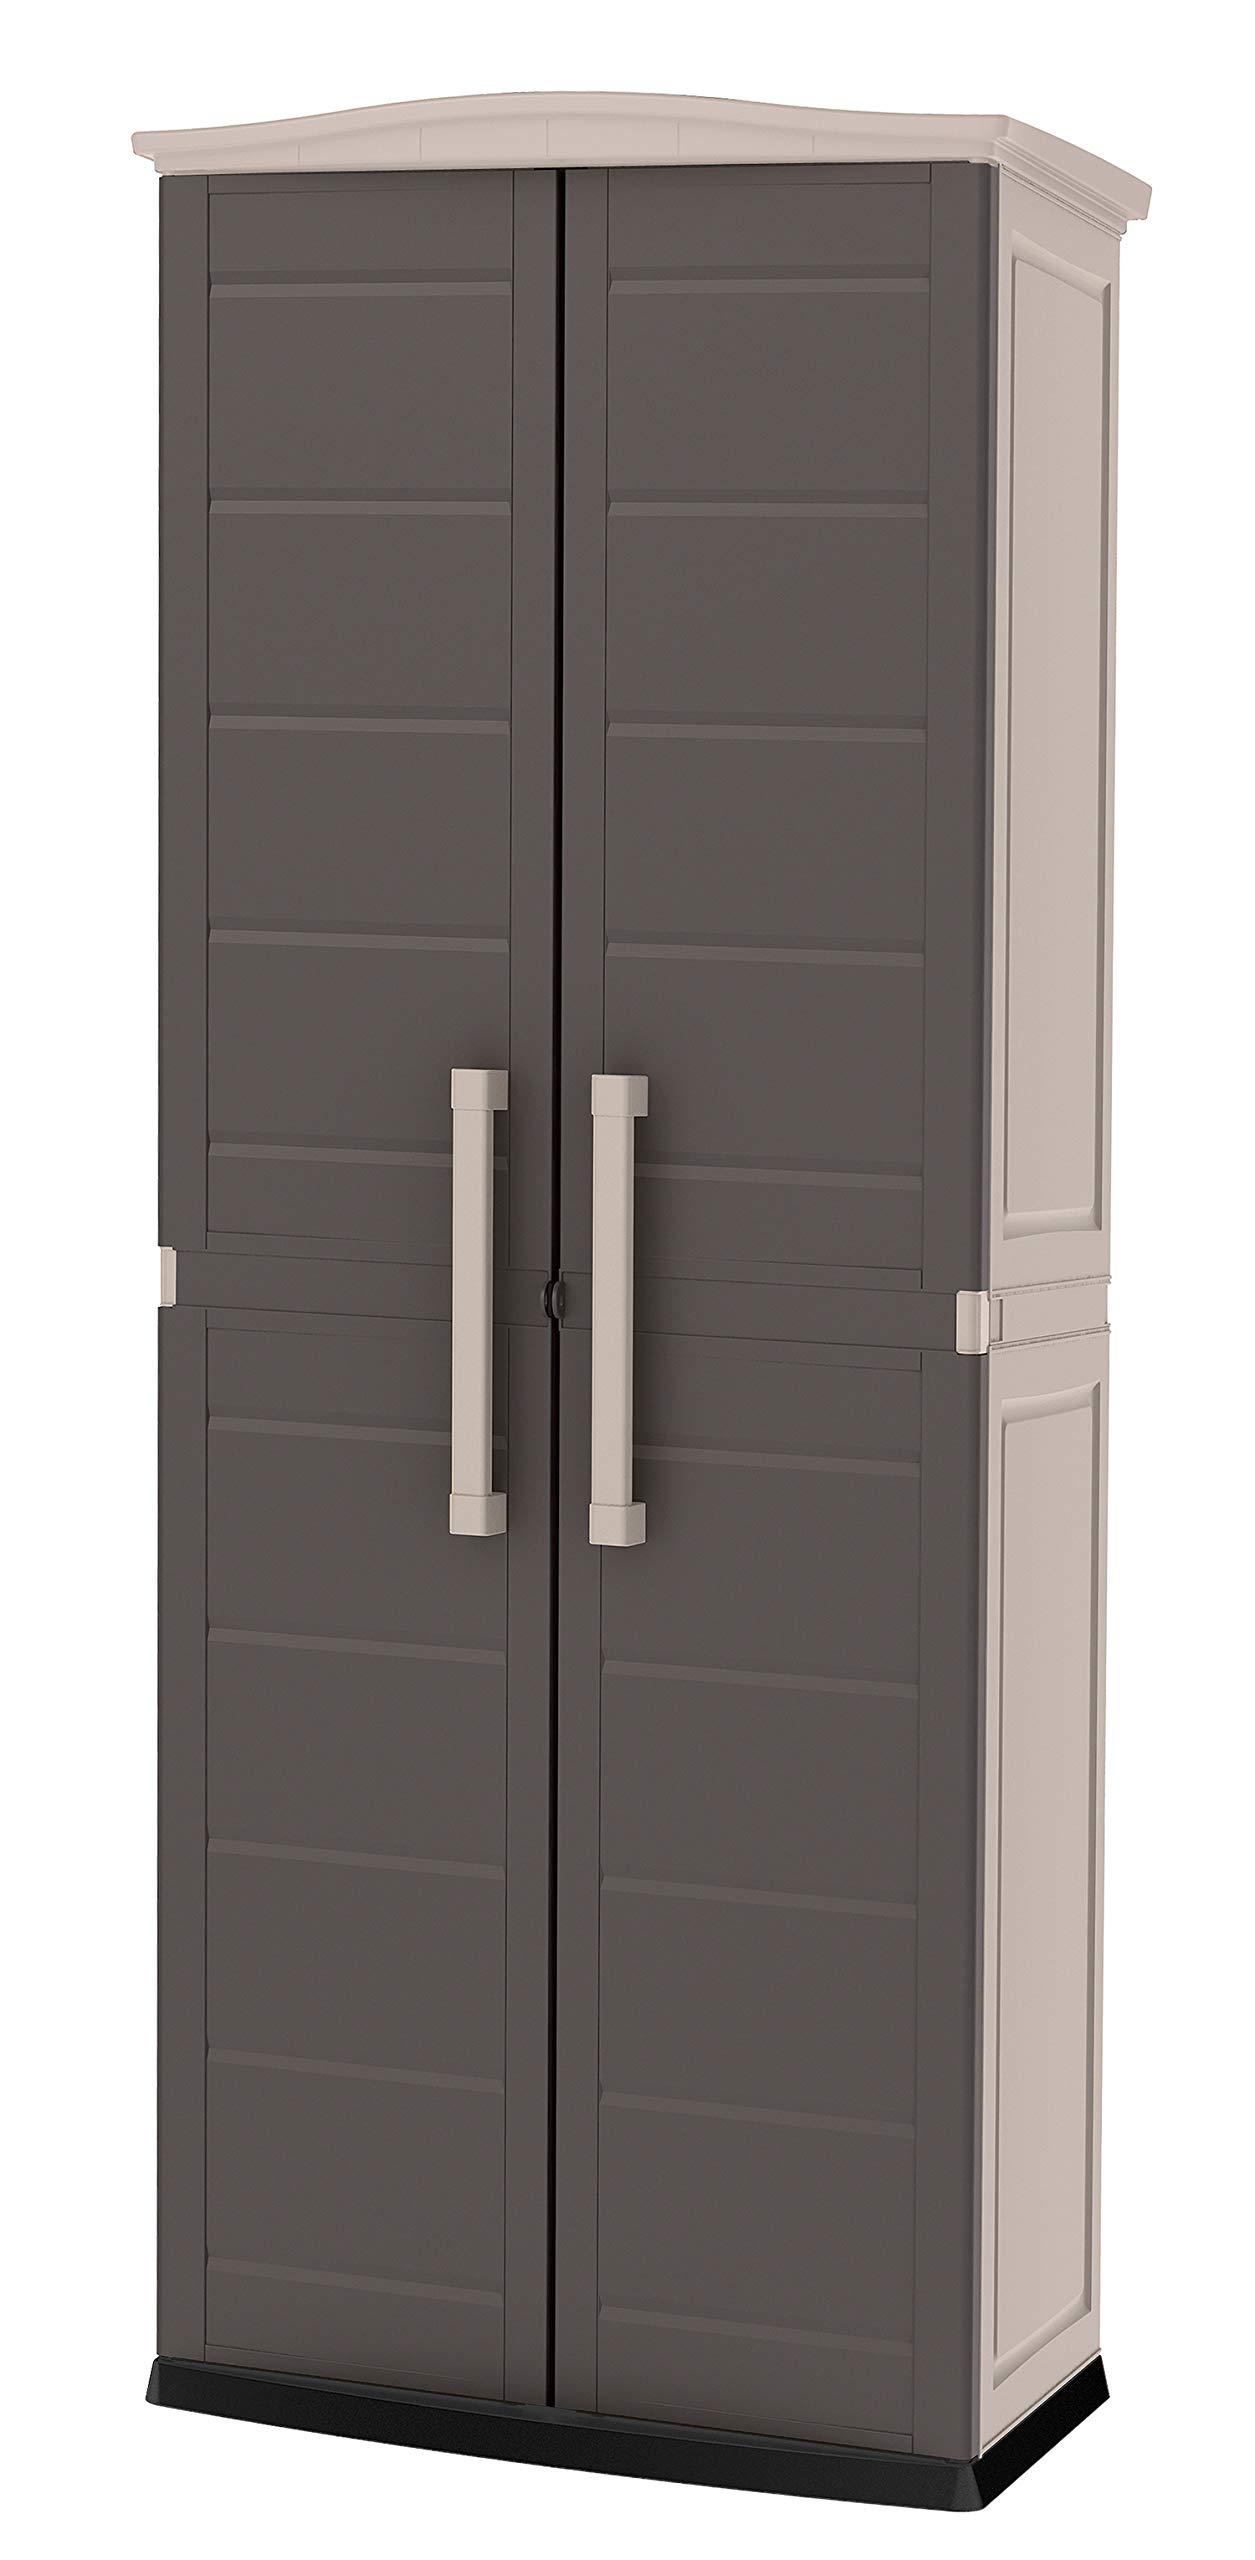 Keter 228852 Outdoor Storage Cabinet